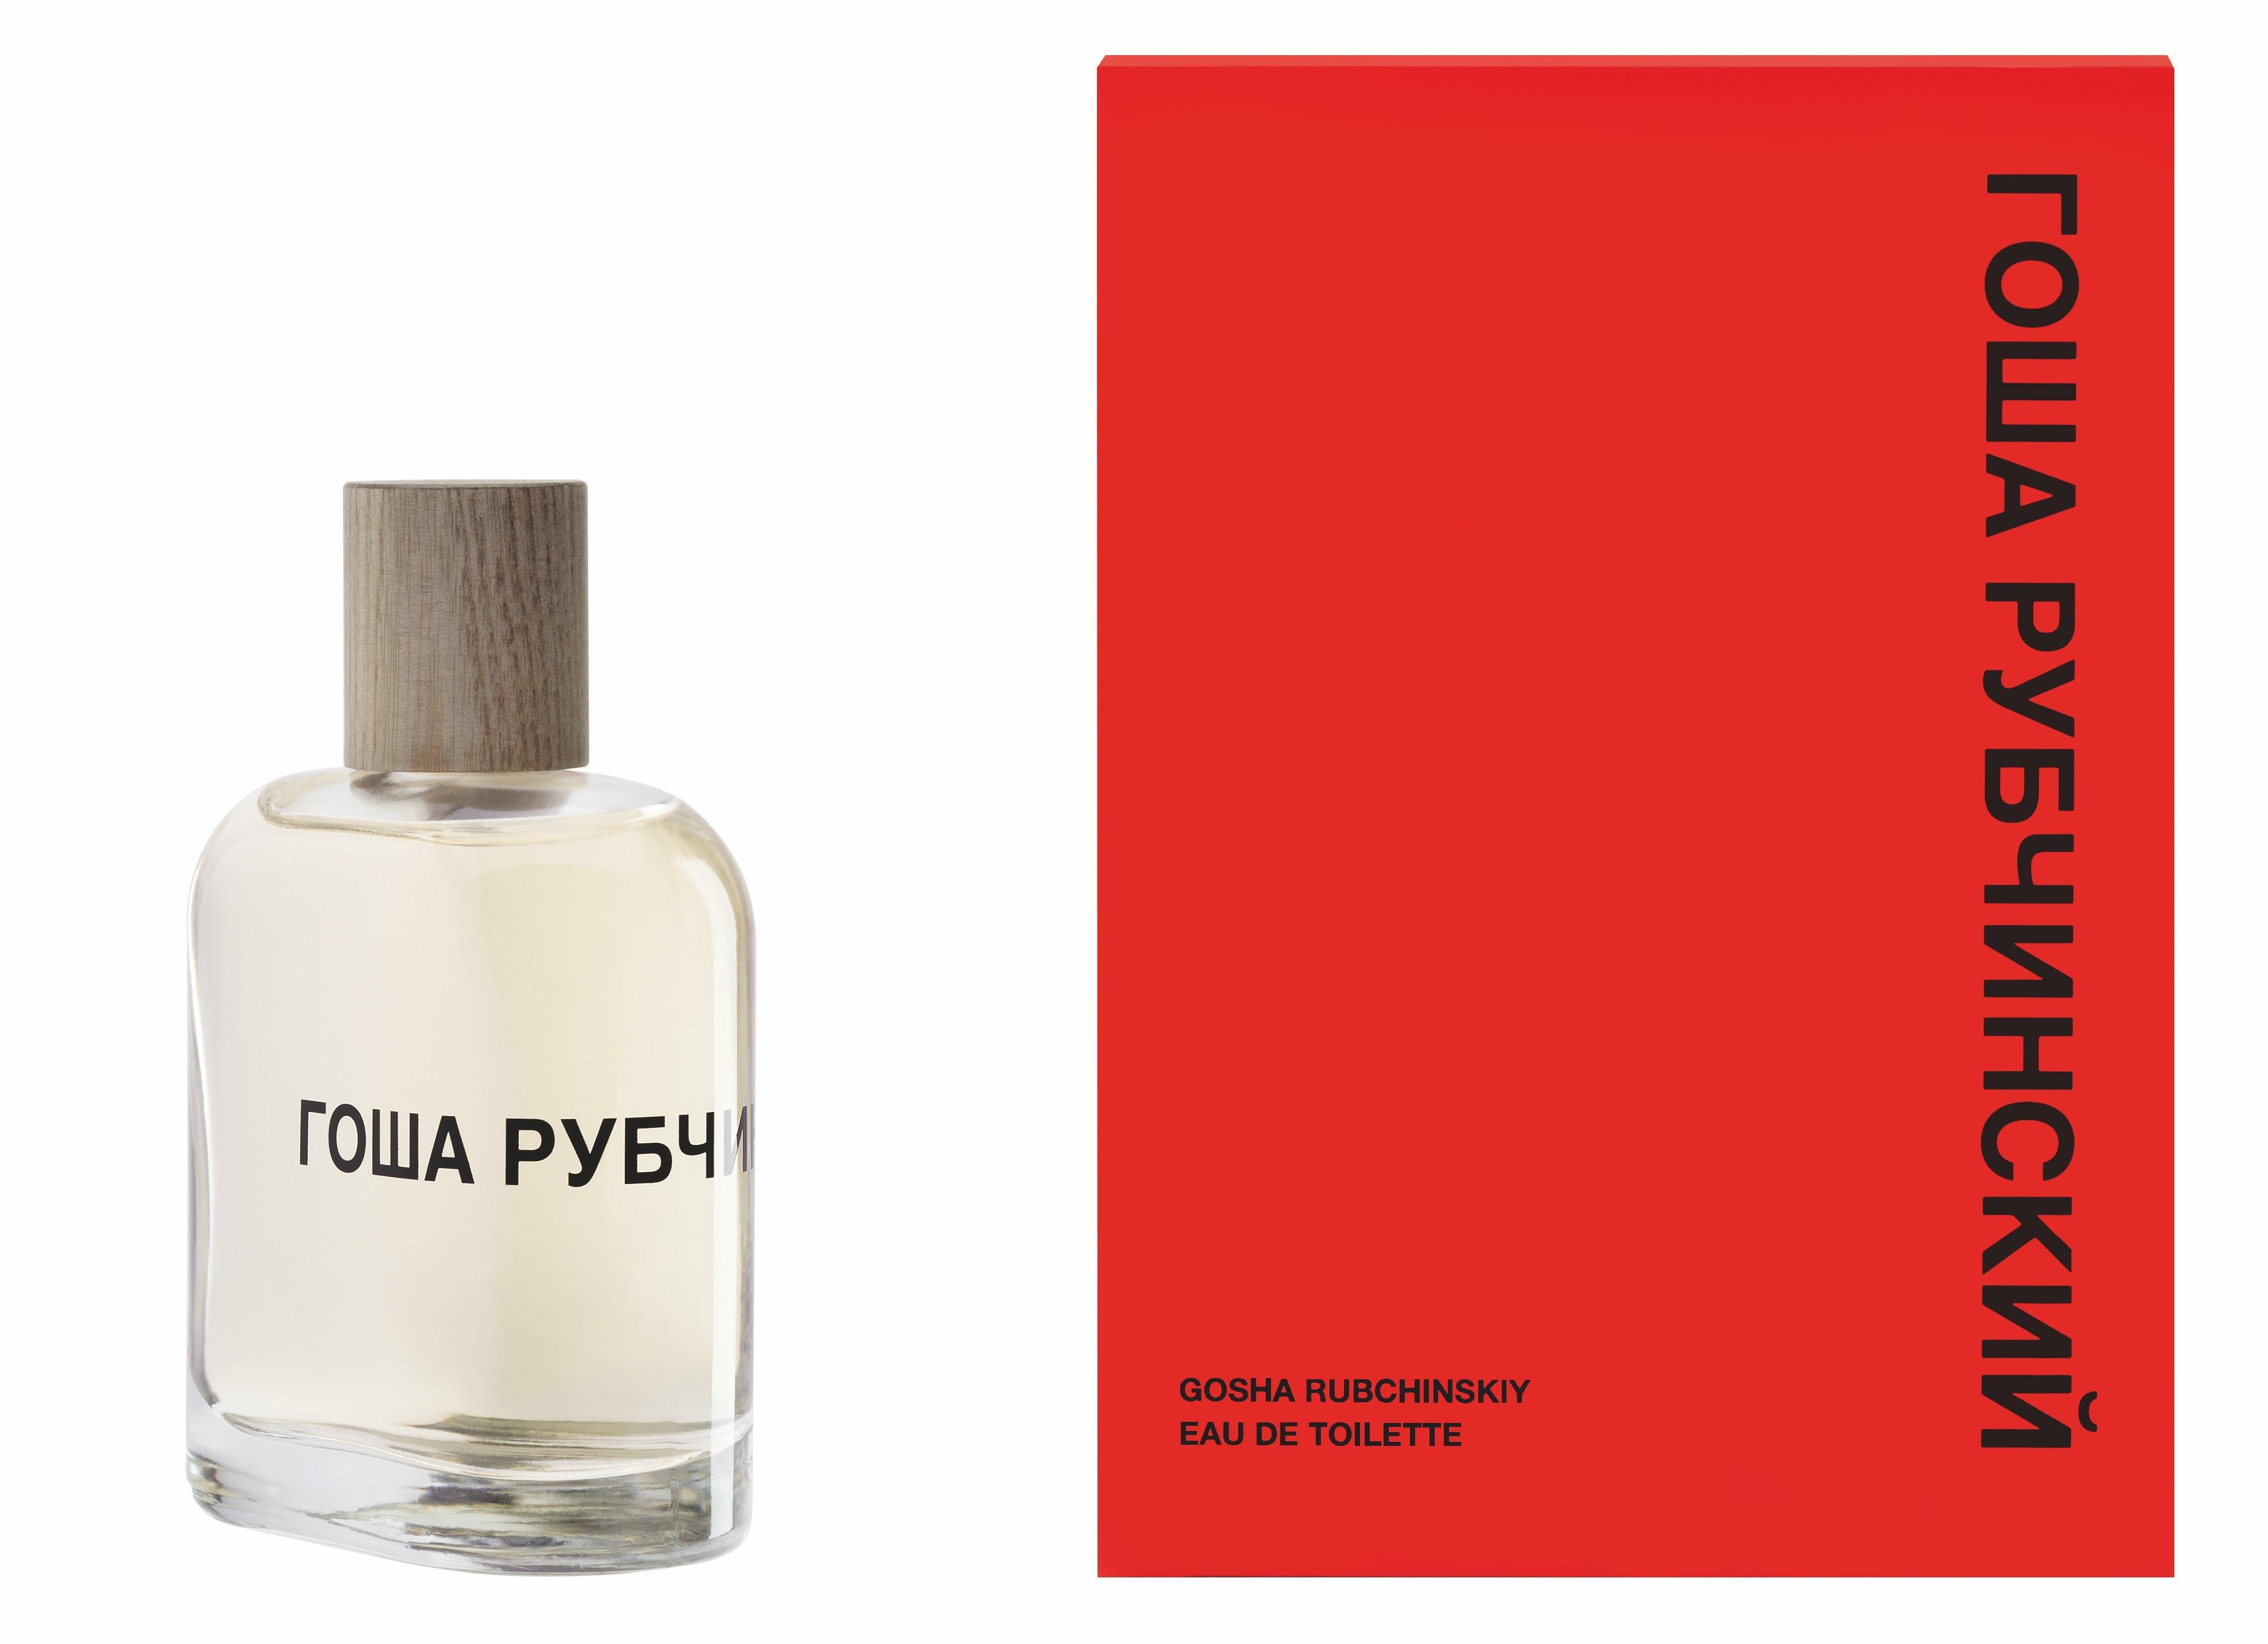 The Gosha Rubchinskiy perfume | Source: Courtesy